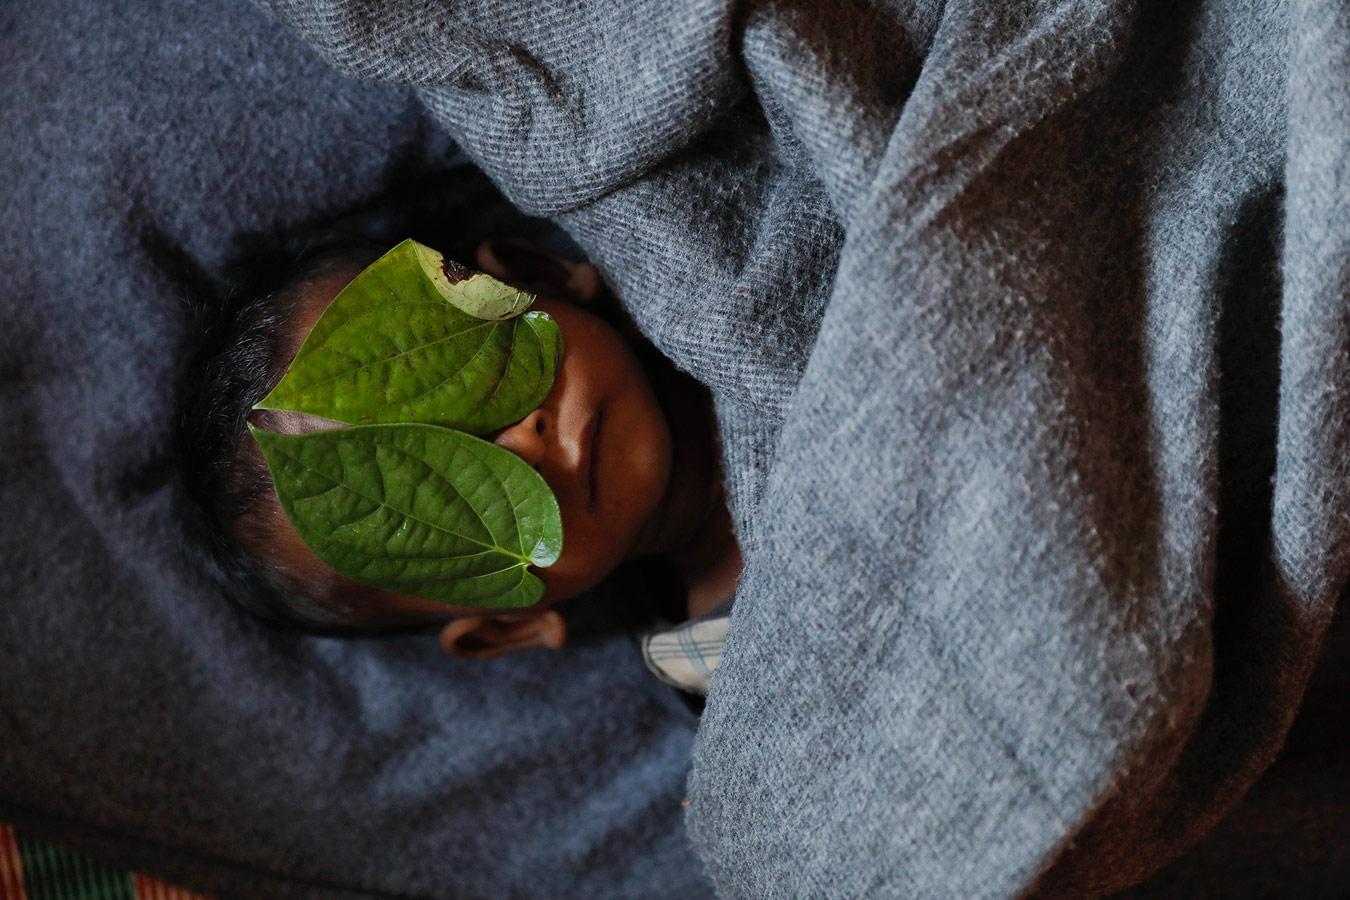 Boy / Bangladesh, © Damir Sagolj / Reuters, Bosnia and Herzegovina, Photo of the Year 2018, Single News 1st Prize, Istanbul Photo Awards